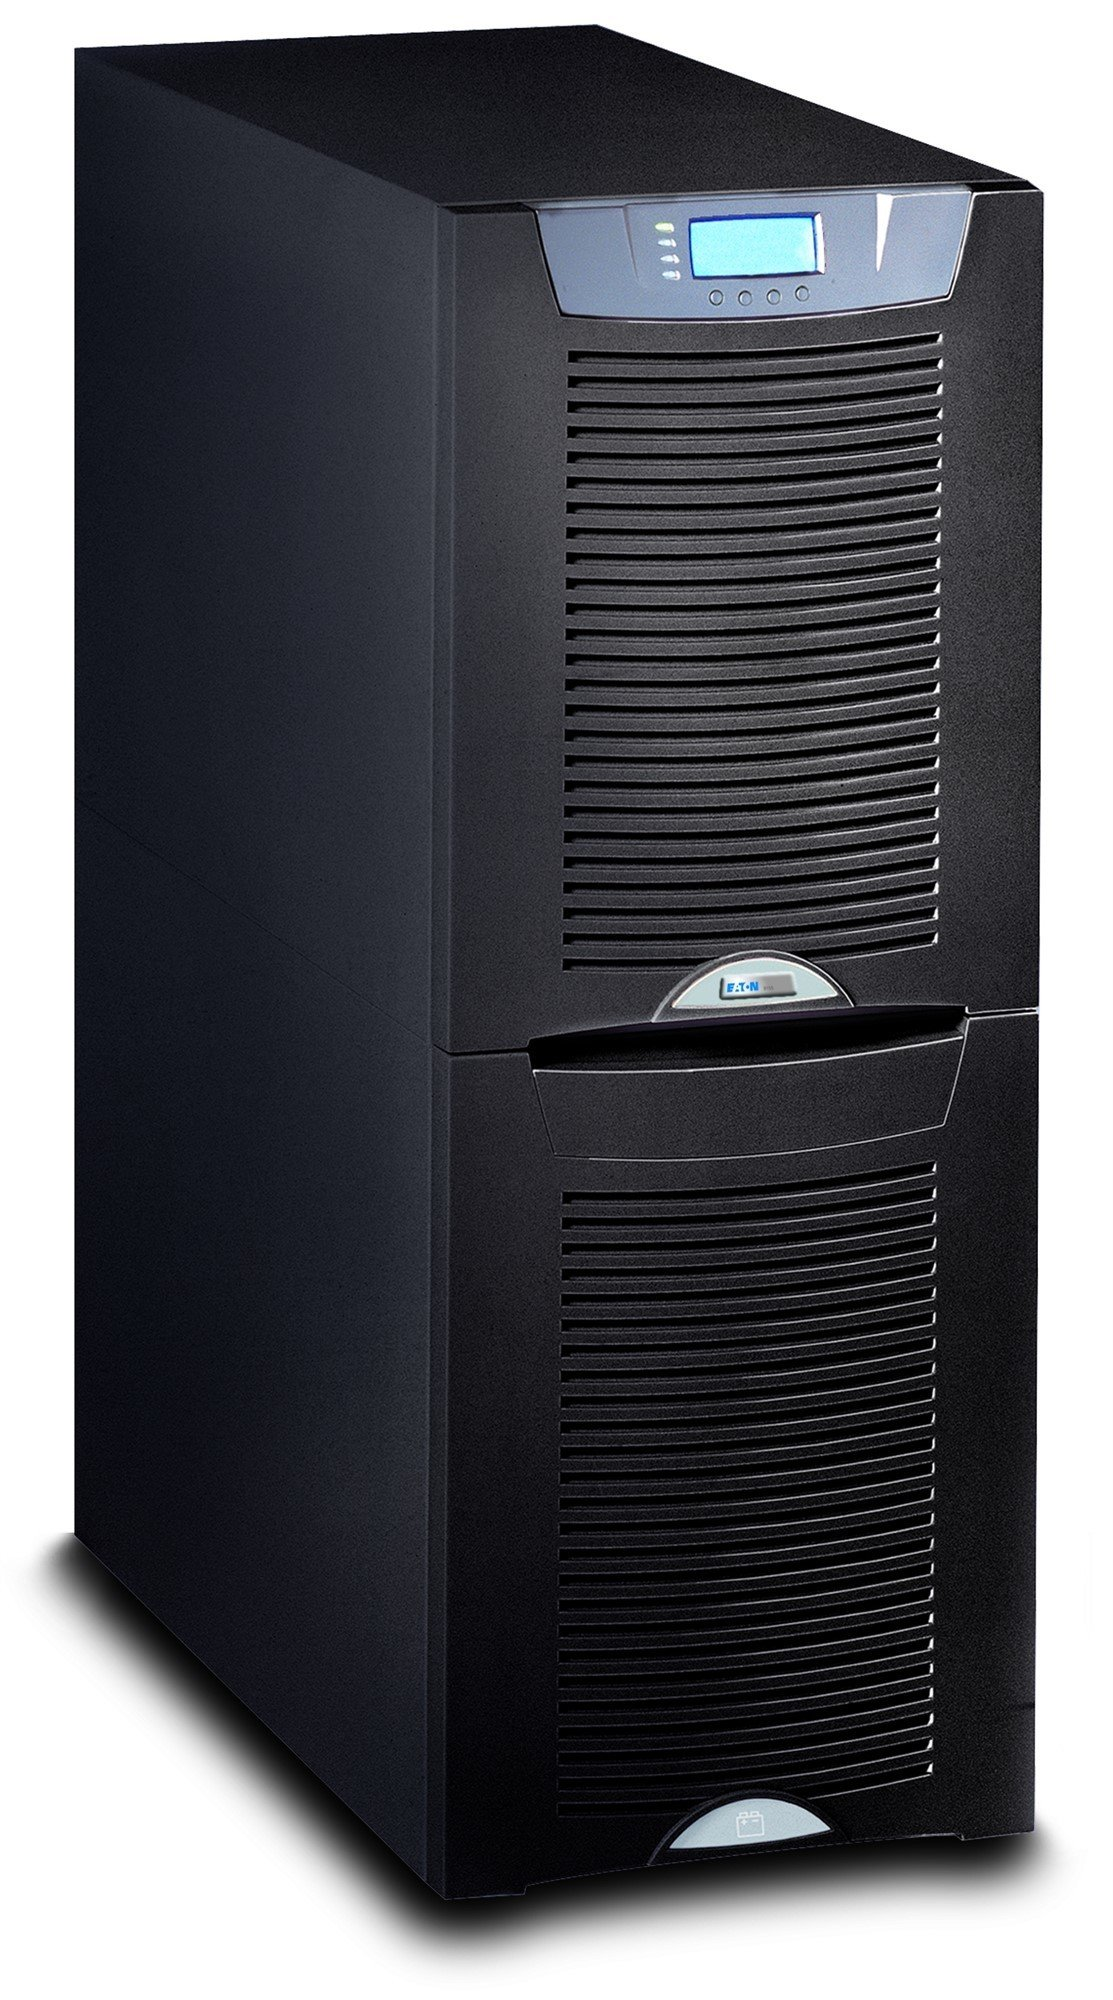 An image of Eaton powerware 9155-8-shs-15-32x9ah uninterruptible power supply (ups) 8000 va